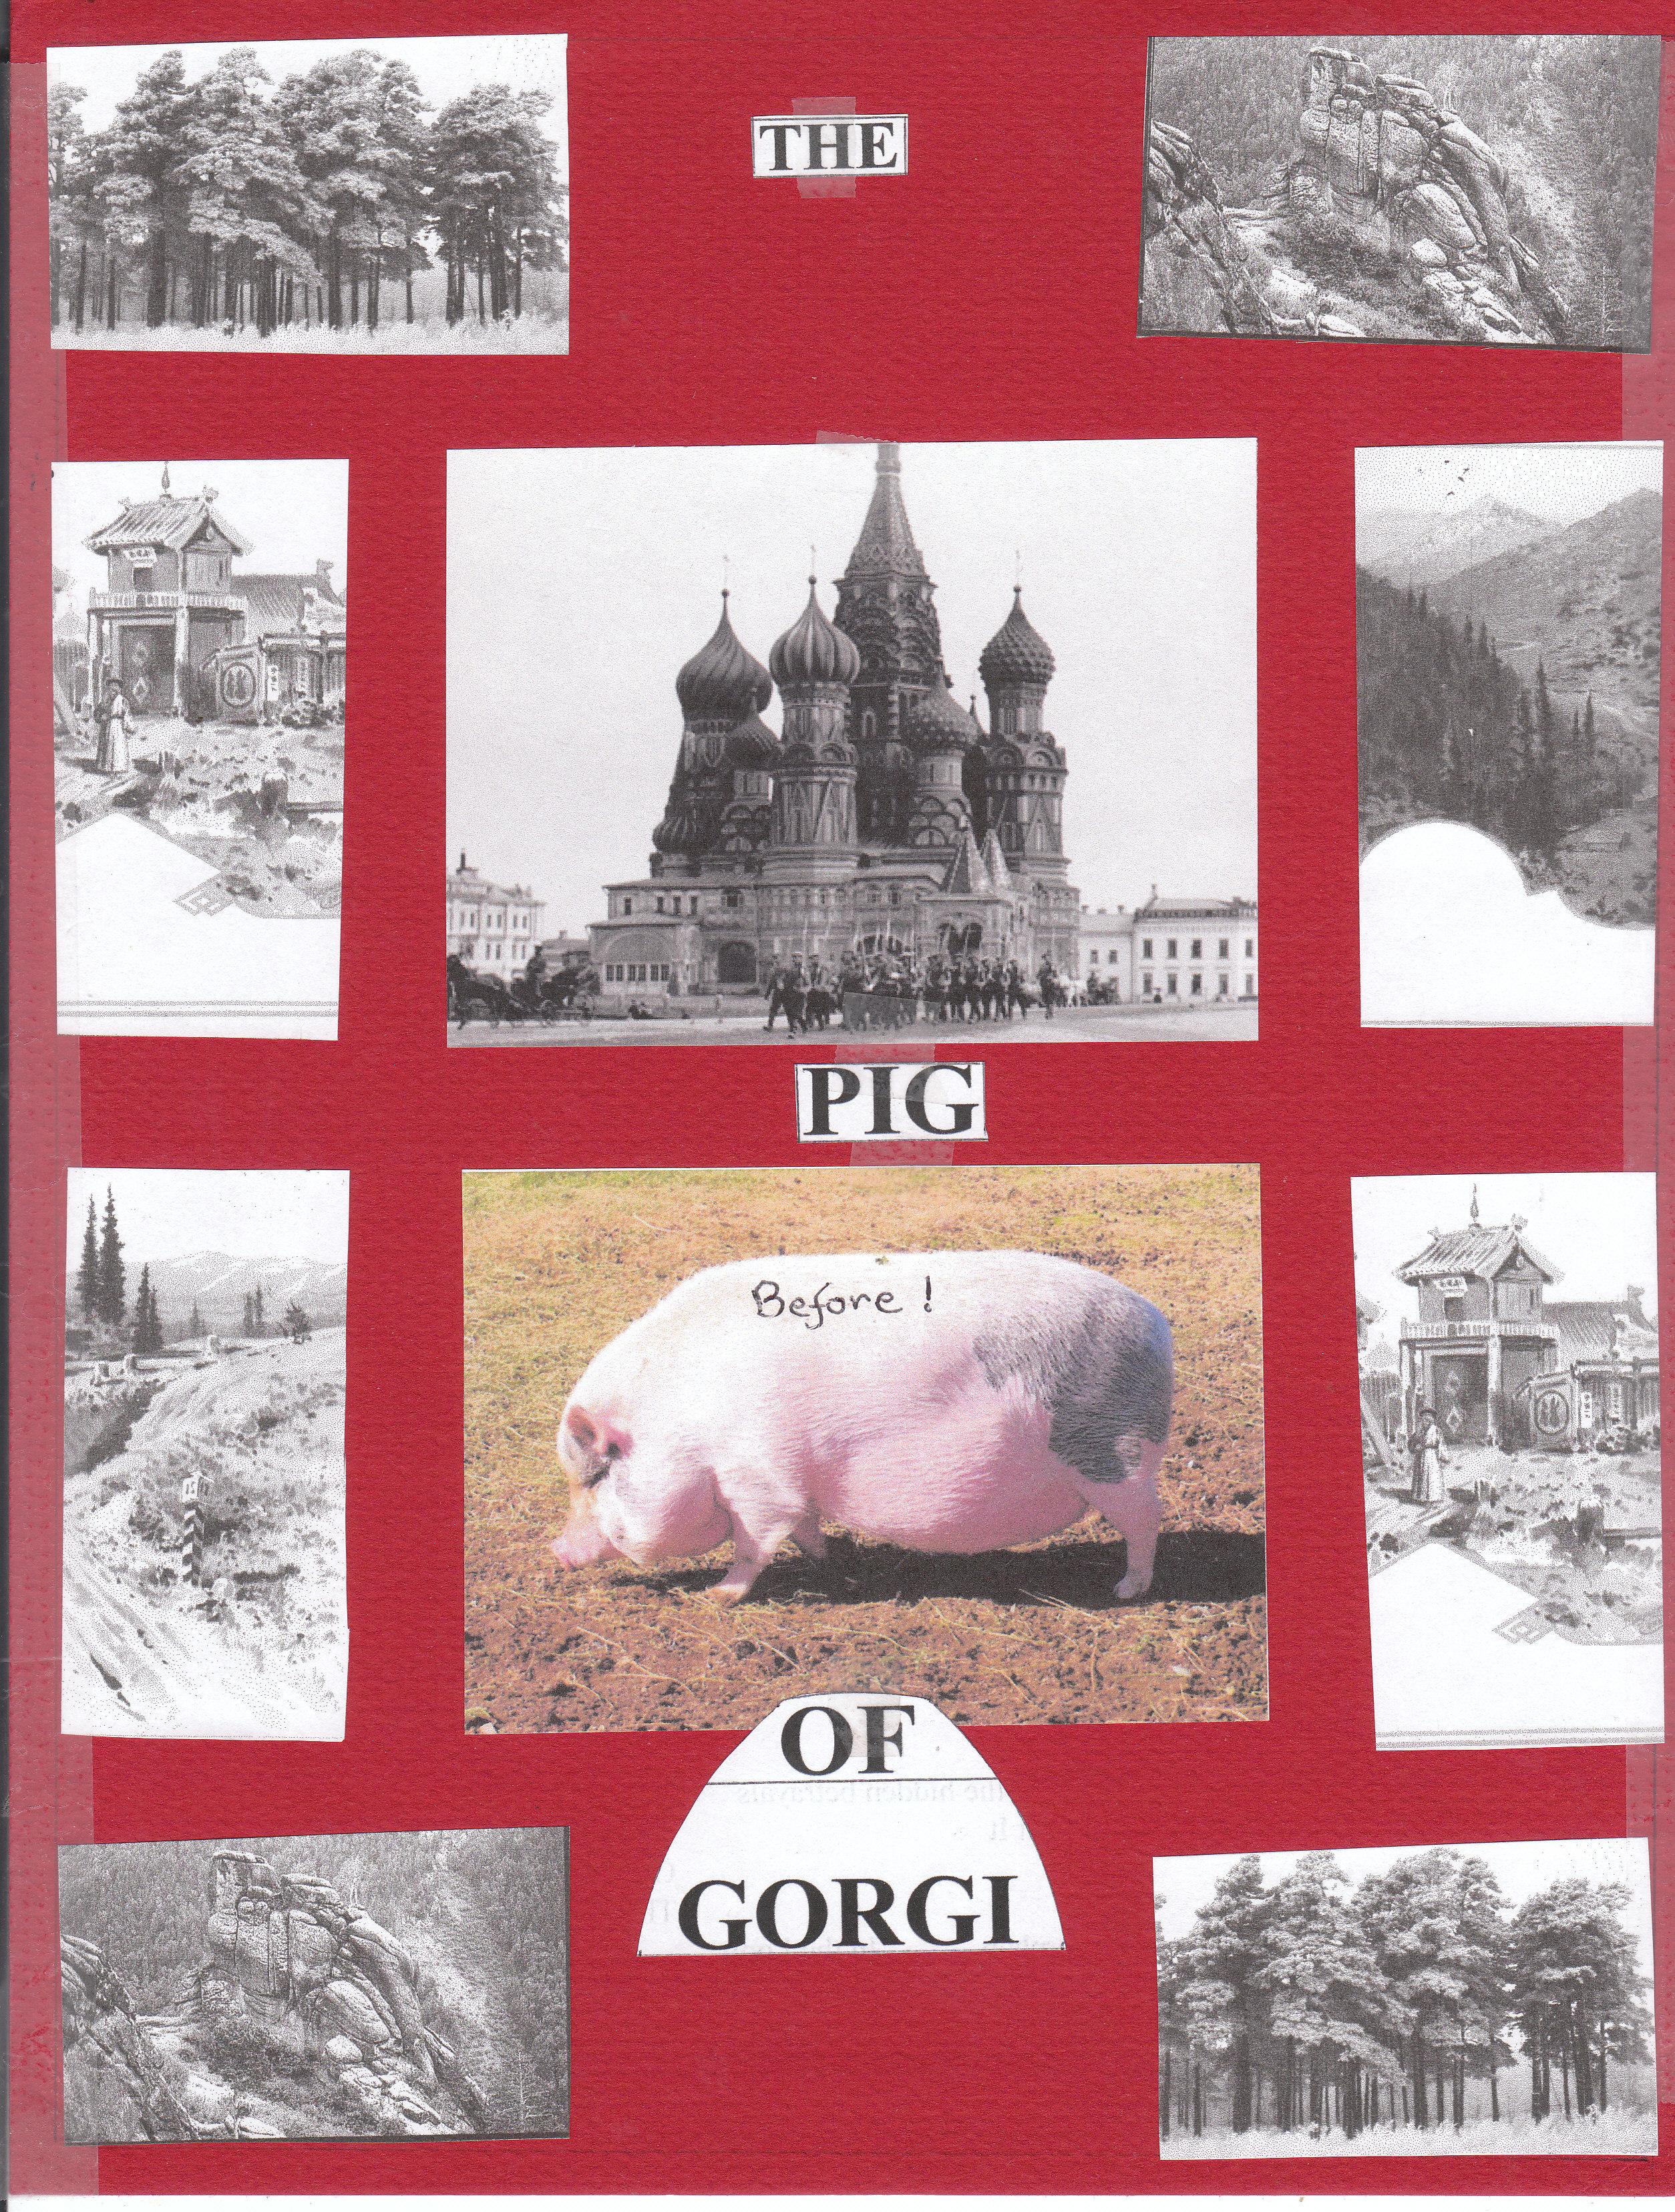 The Pig Of Gorgi  by  suzi ayna